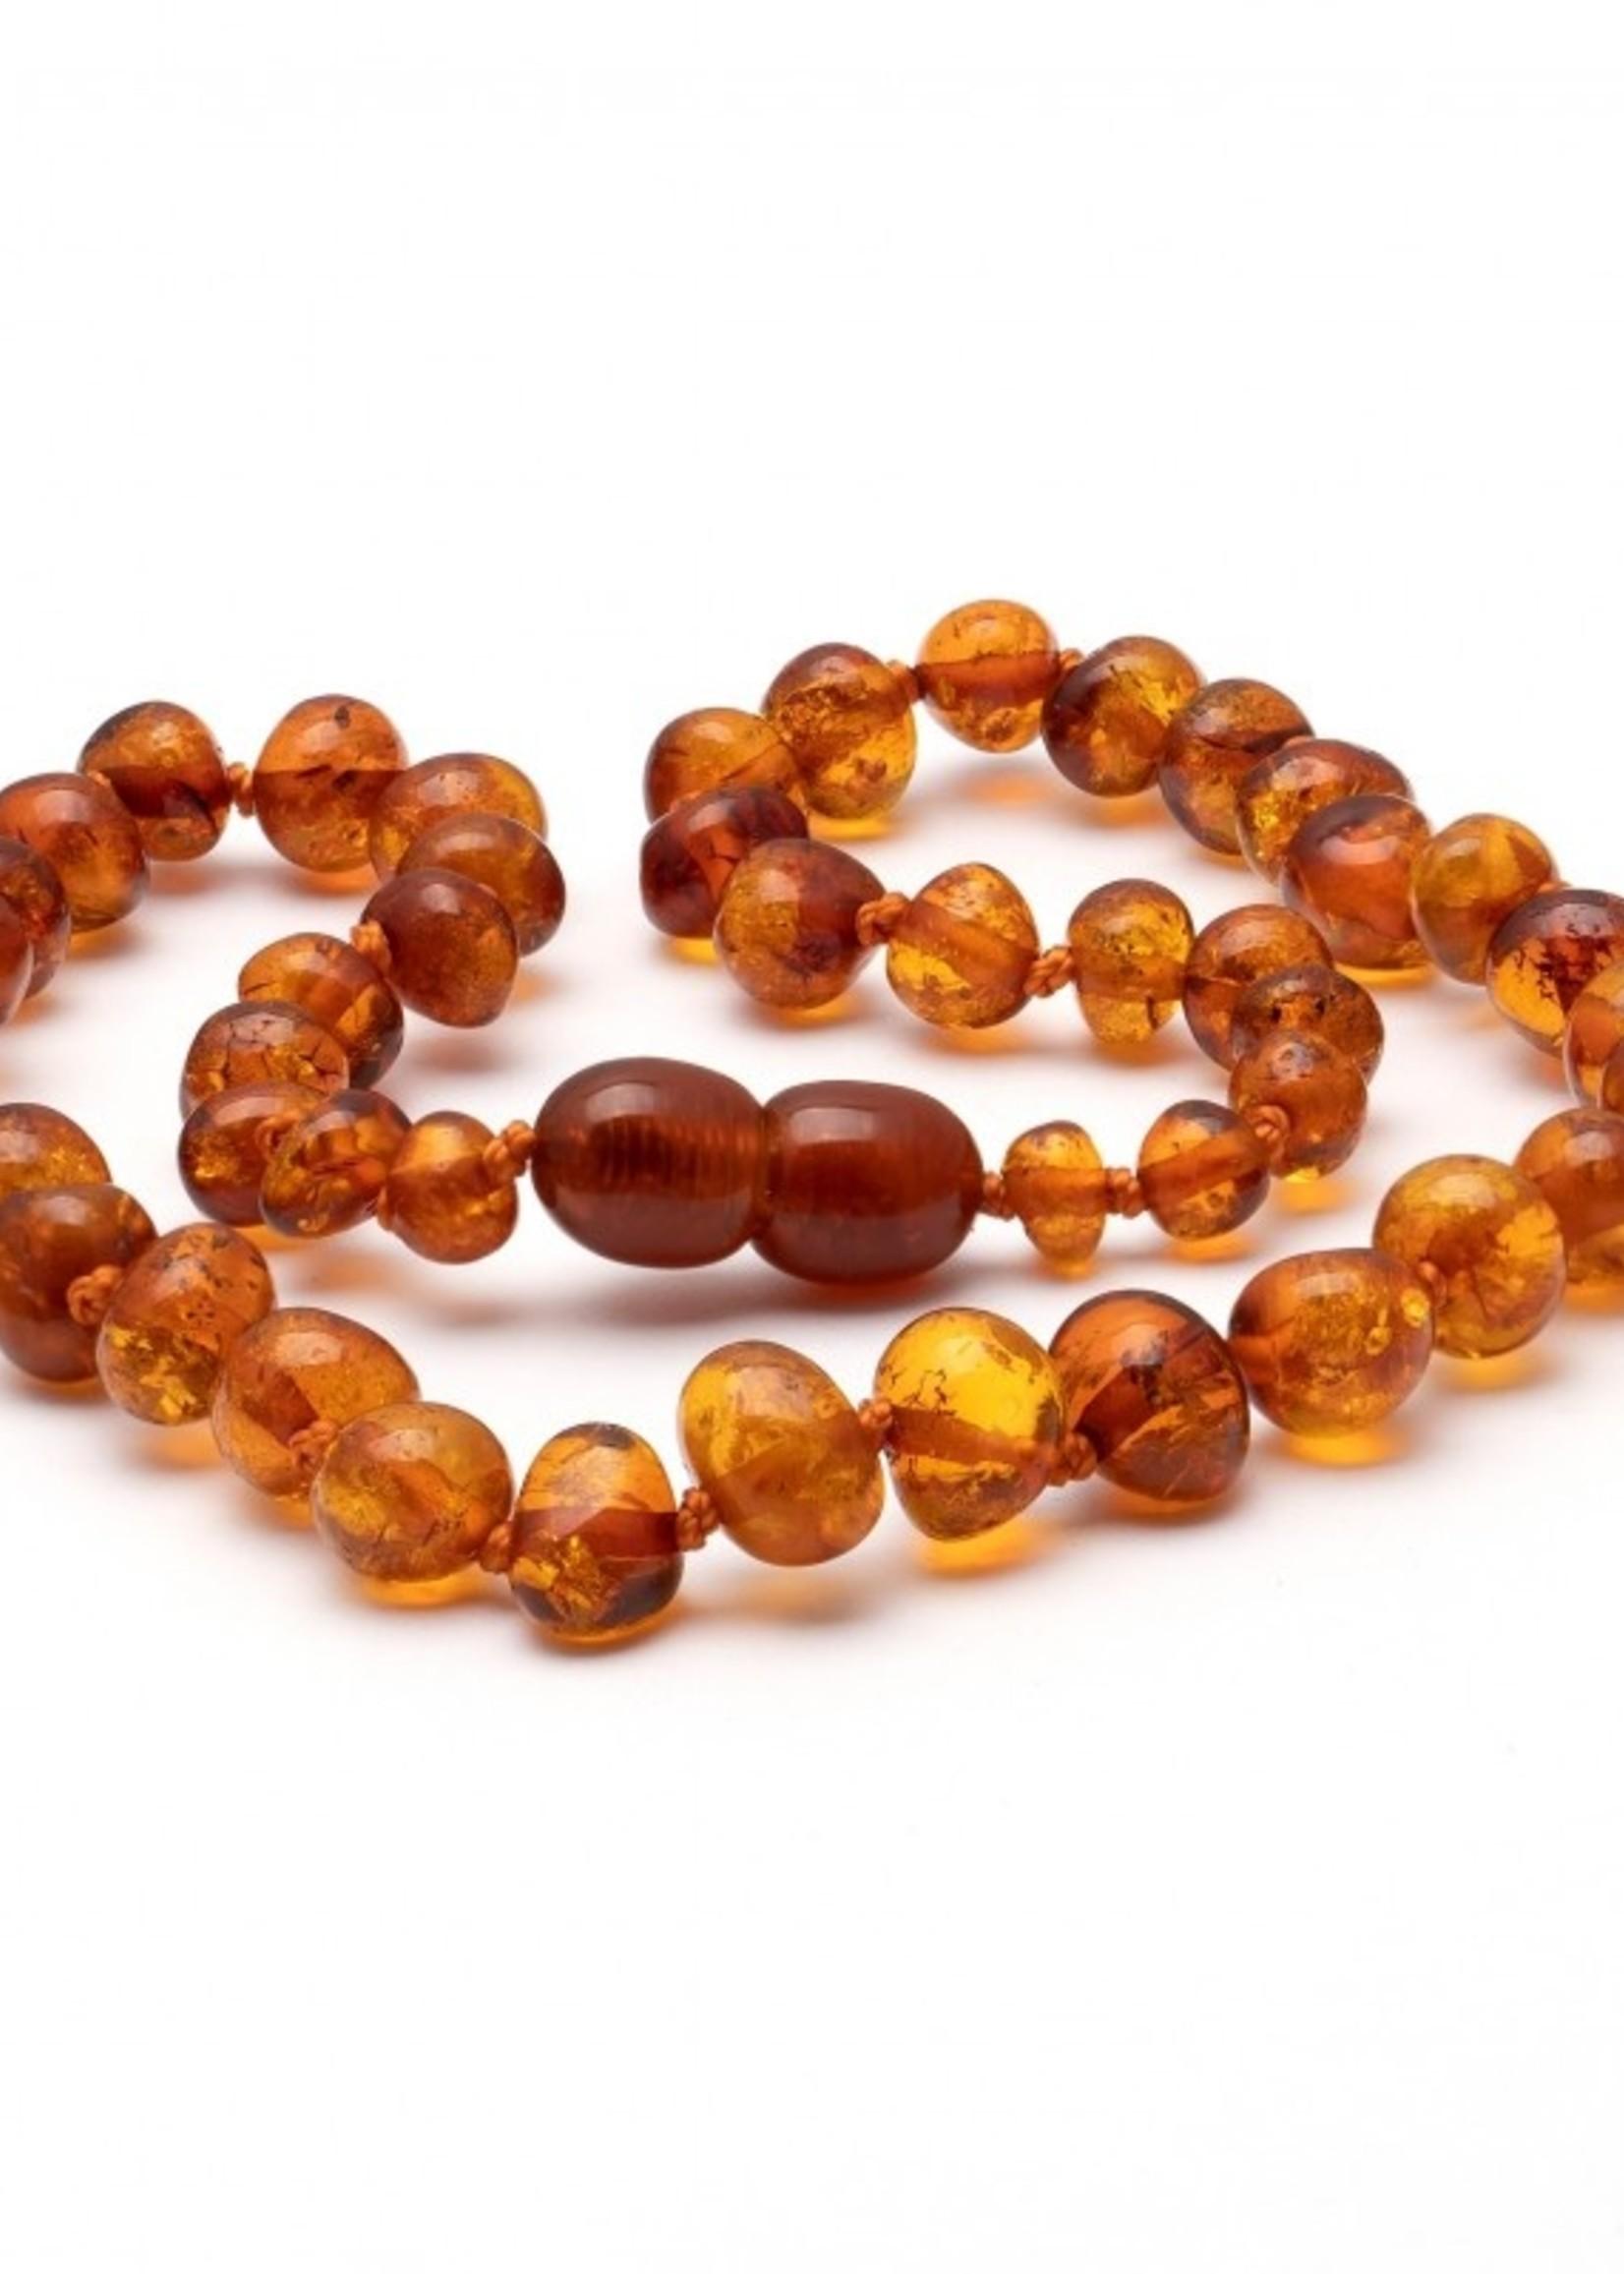 Amber Baroque Amber Teething Necklace - Cognac